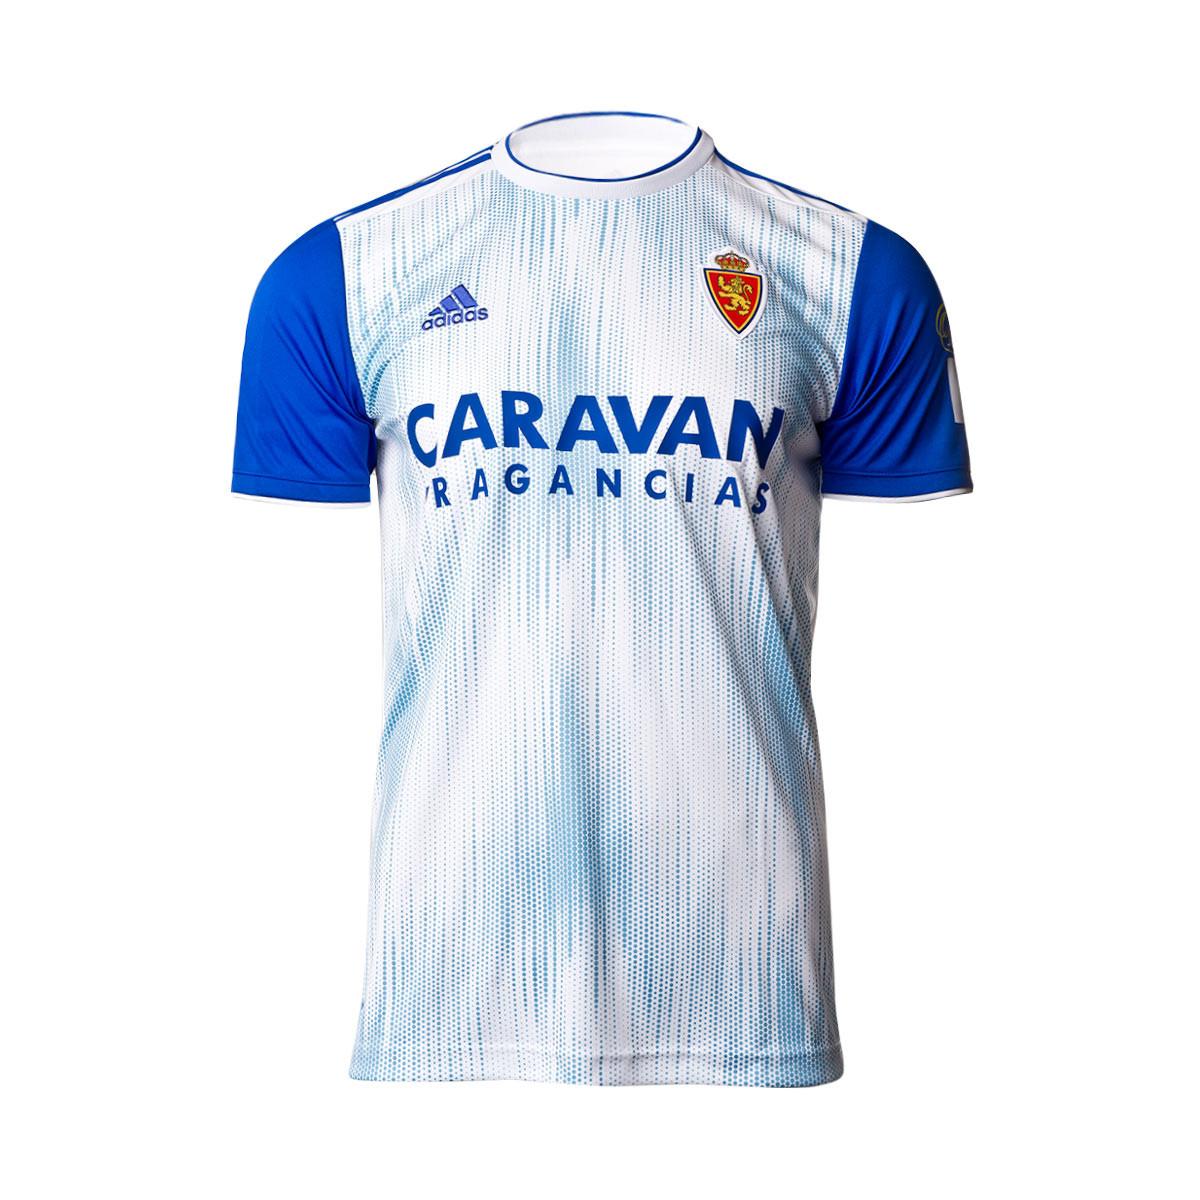 Camisa de Futebol Zaragoza (Espanha)